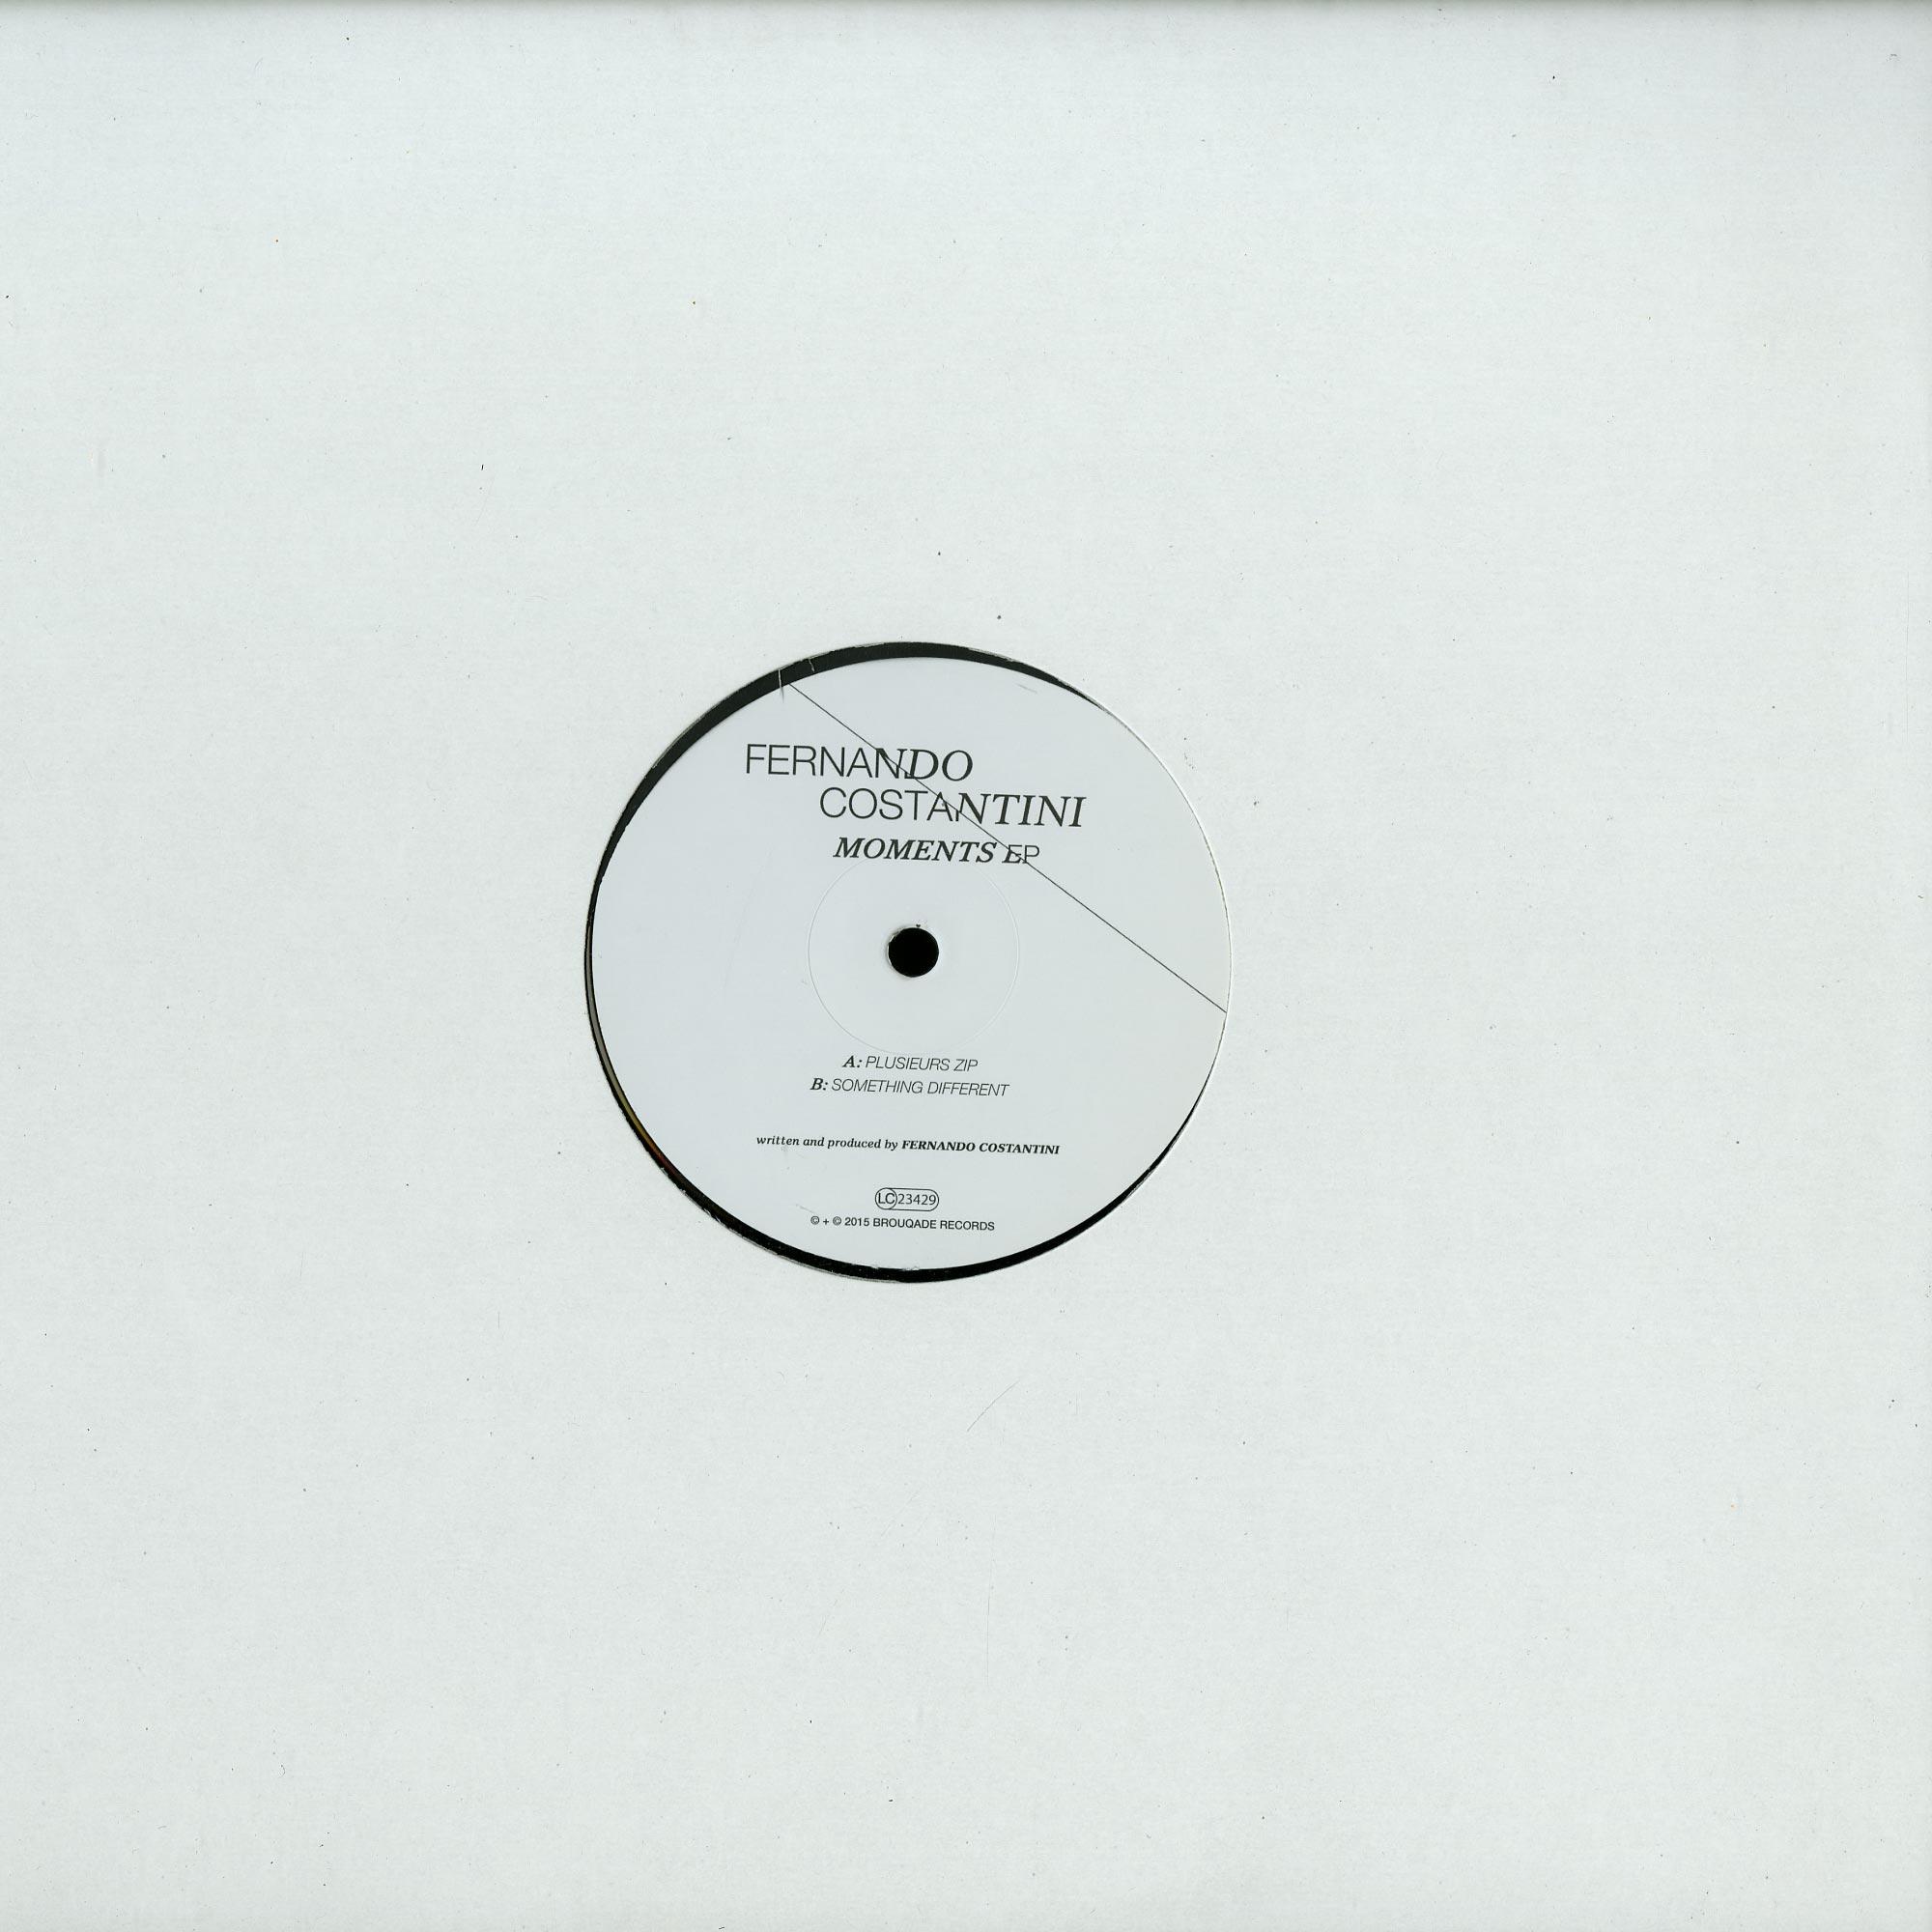 Fernando Costantini - MOMENTS EP